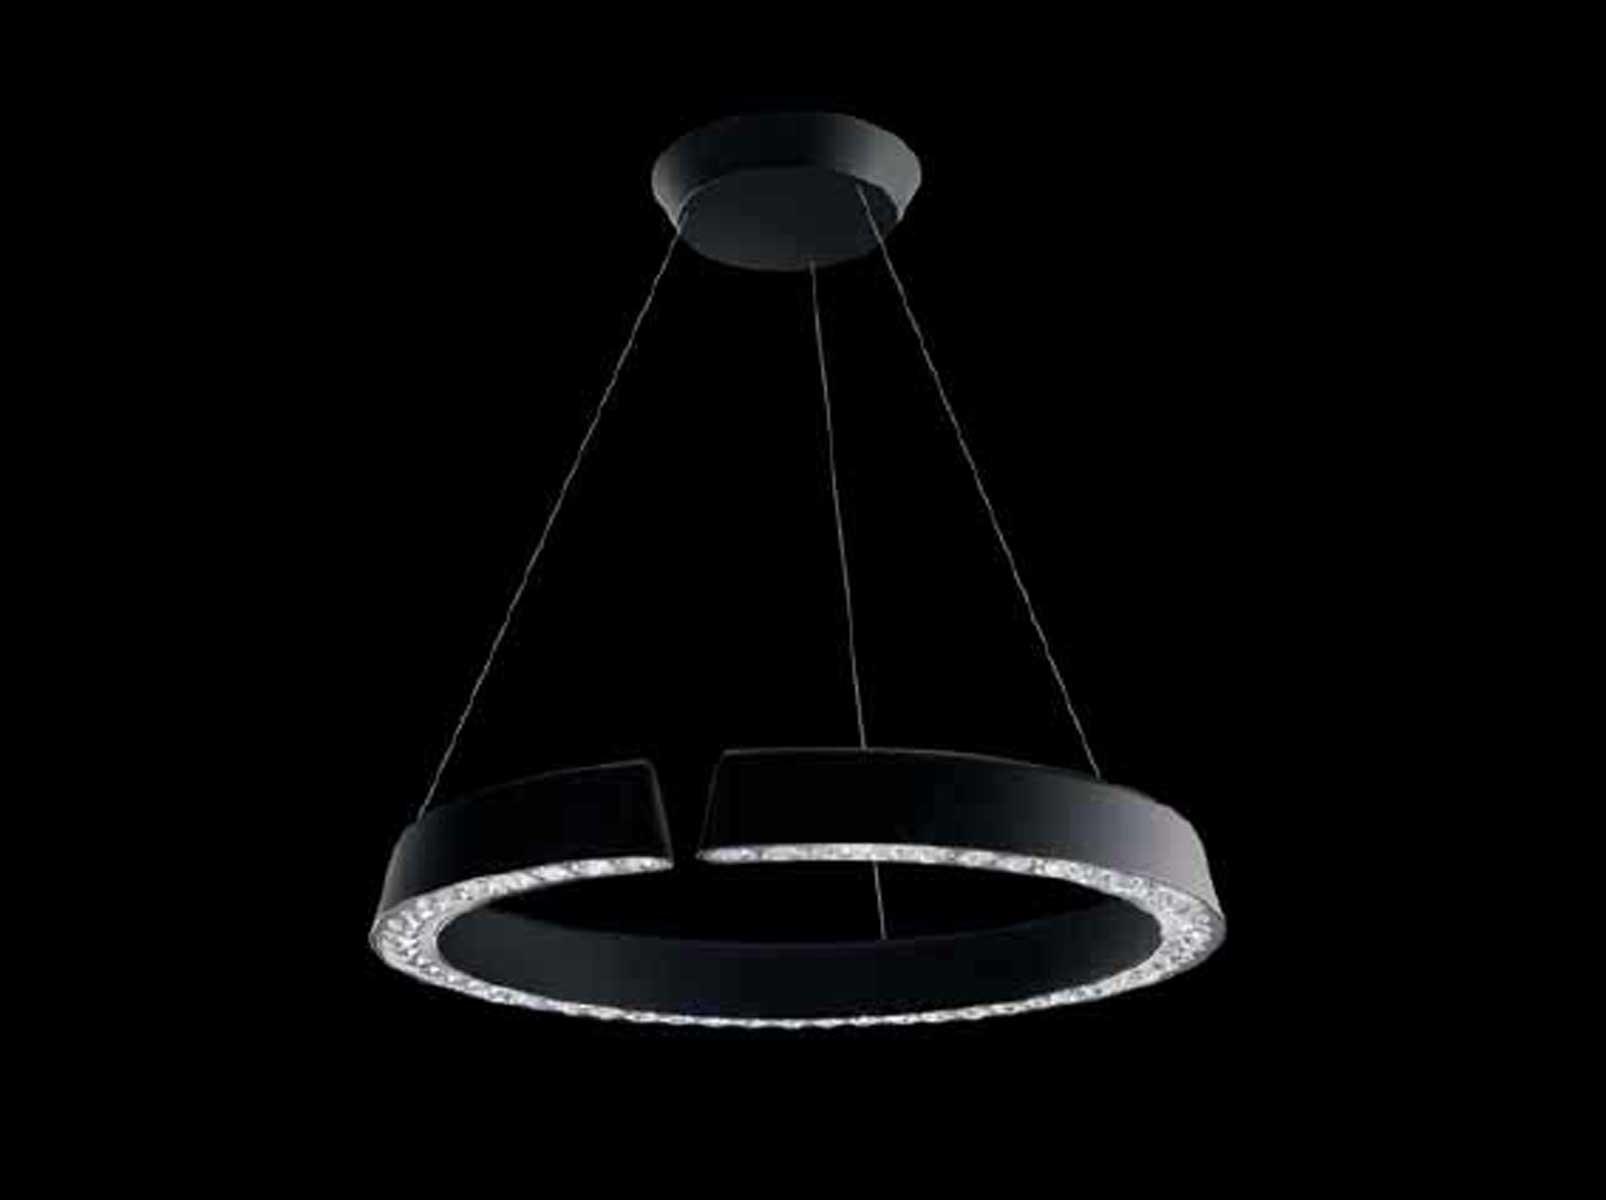 INSIDE/OUT Pendant lamp by Swarovski design Stephen Burks